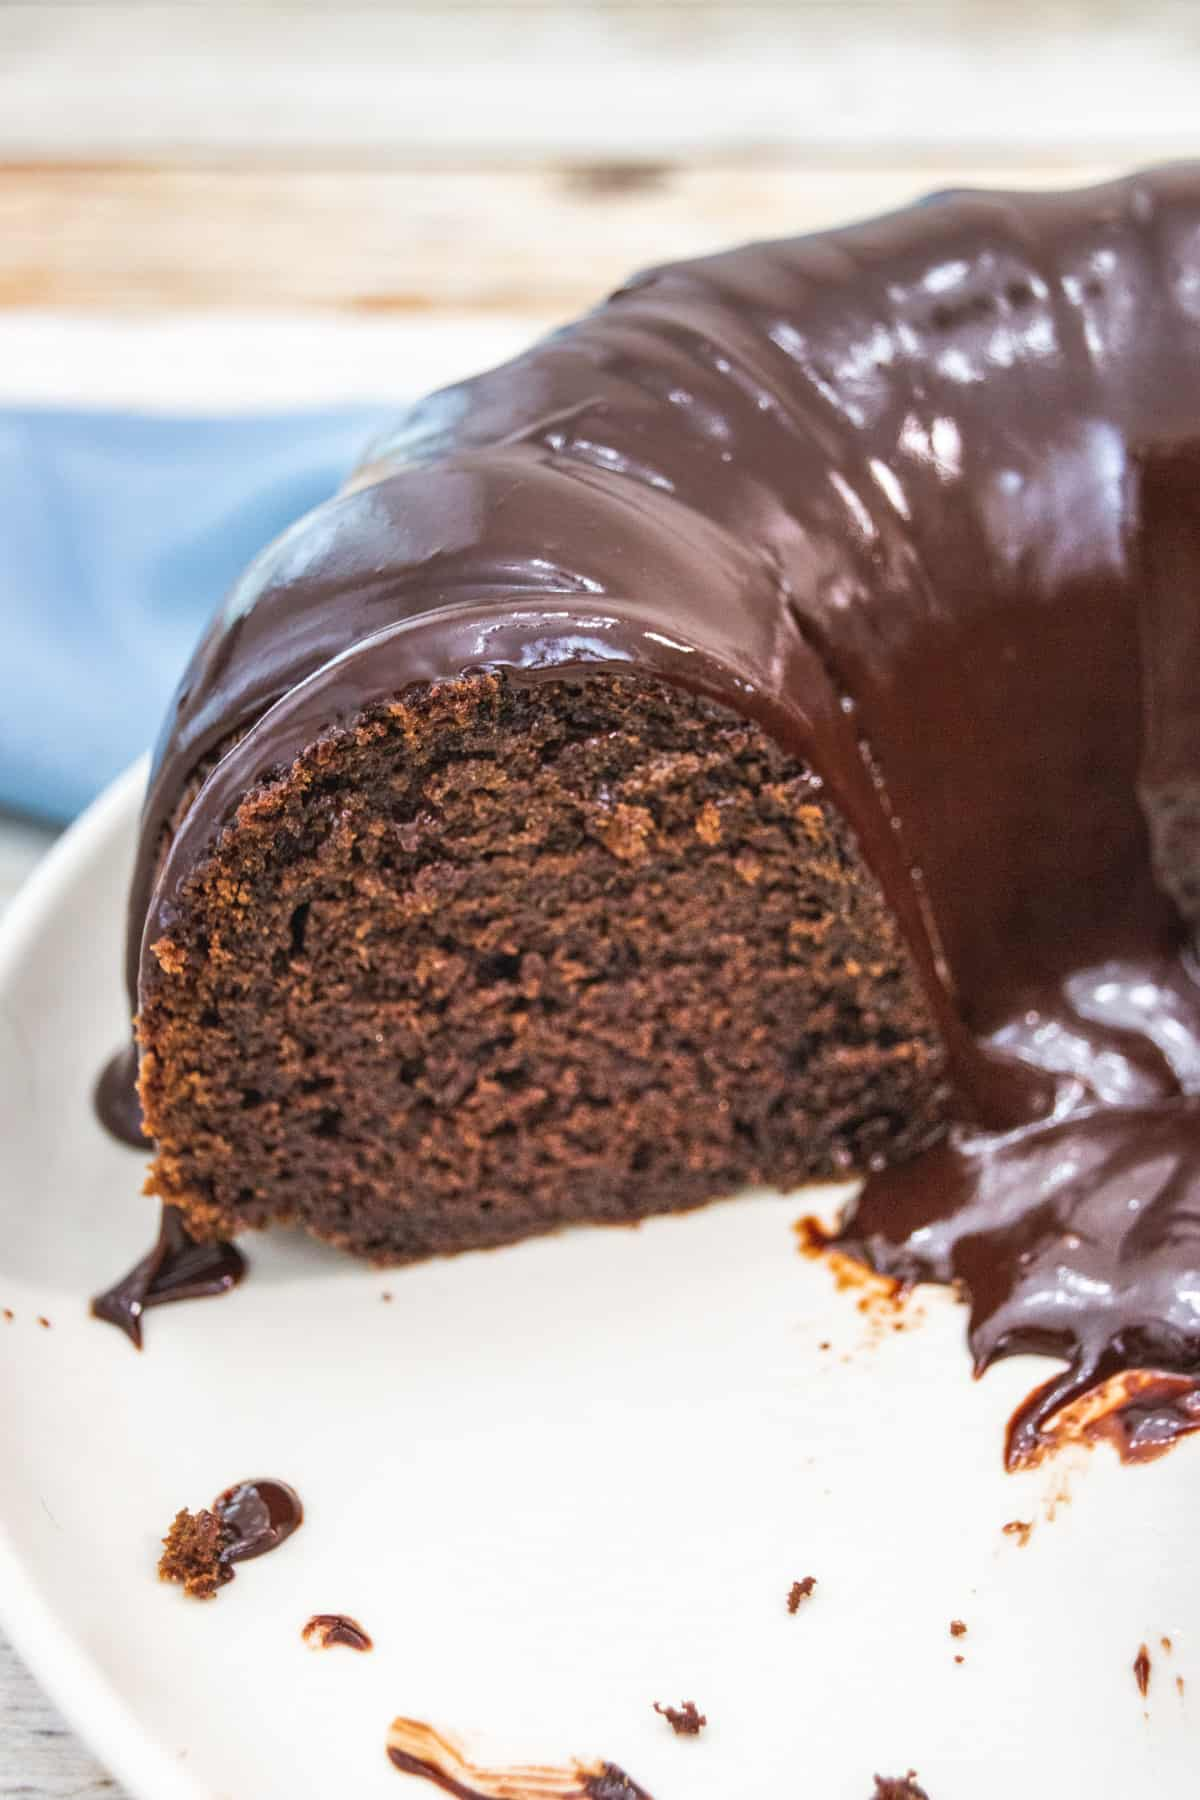 chocolate pound cake with glaze on a plate